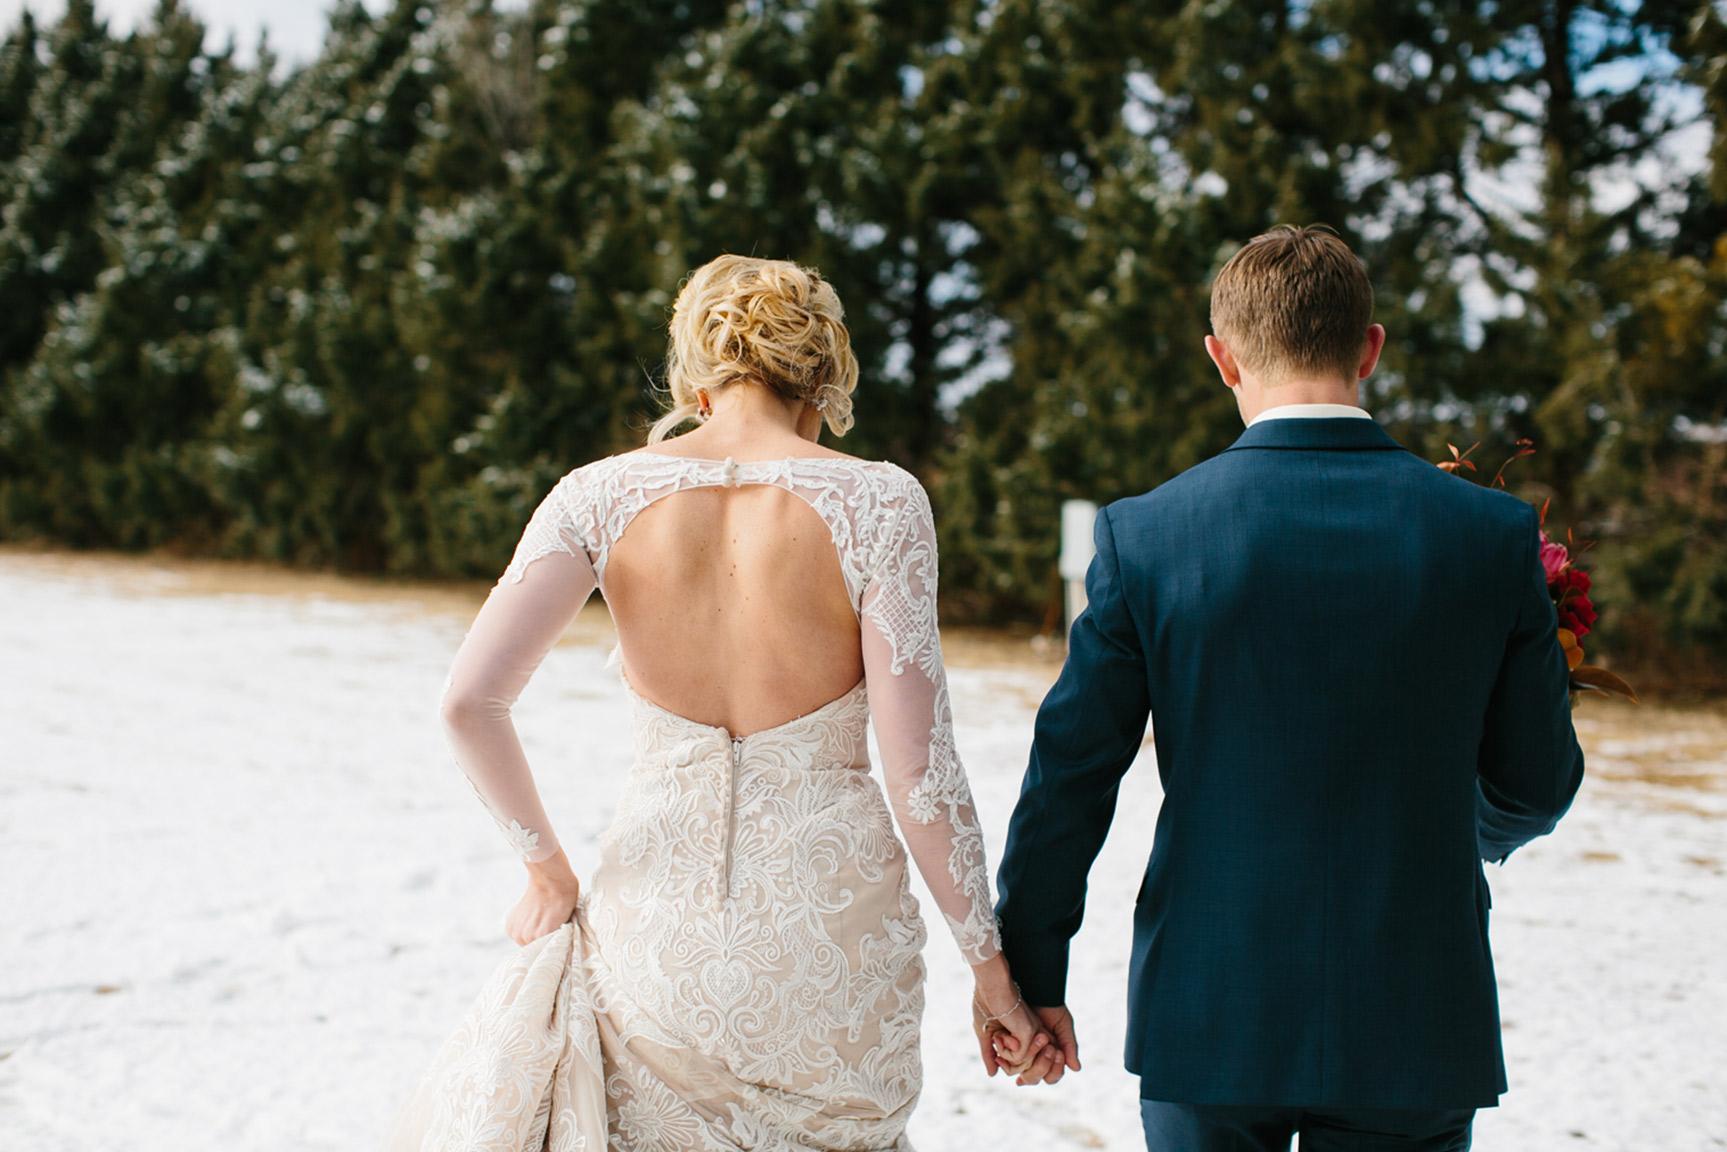 Cotton_Creek_Barn_Winter_Wedding_WeddingPhotographer026.jpg